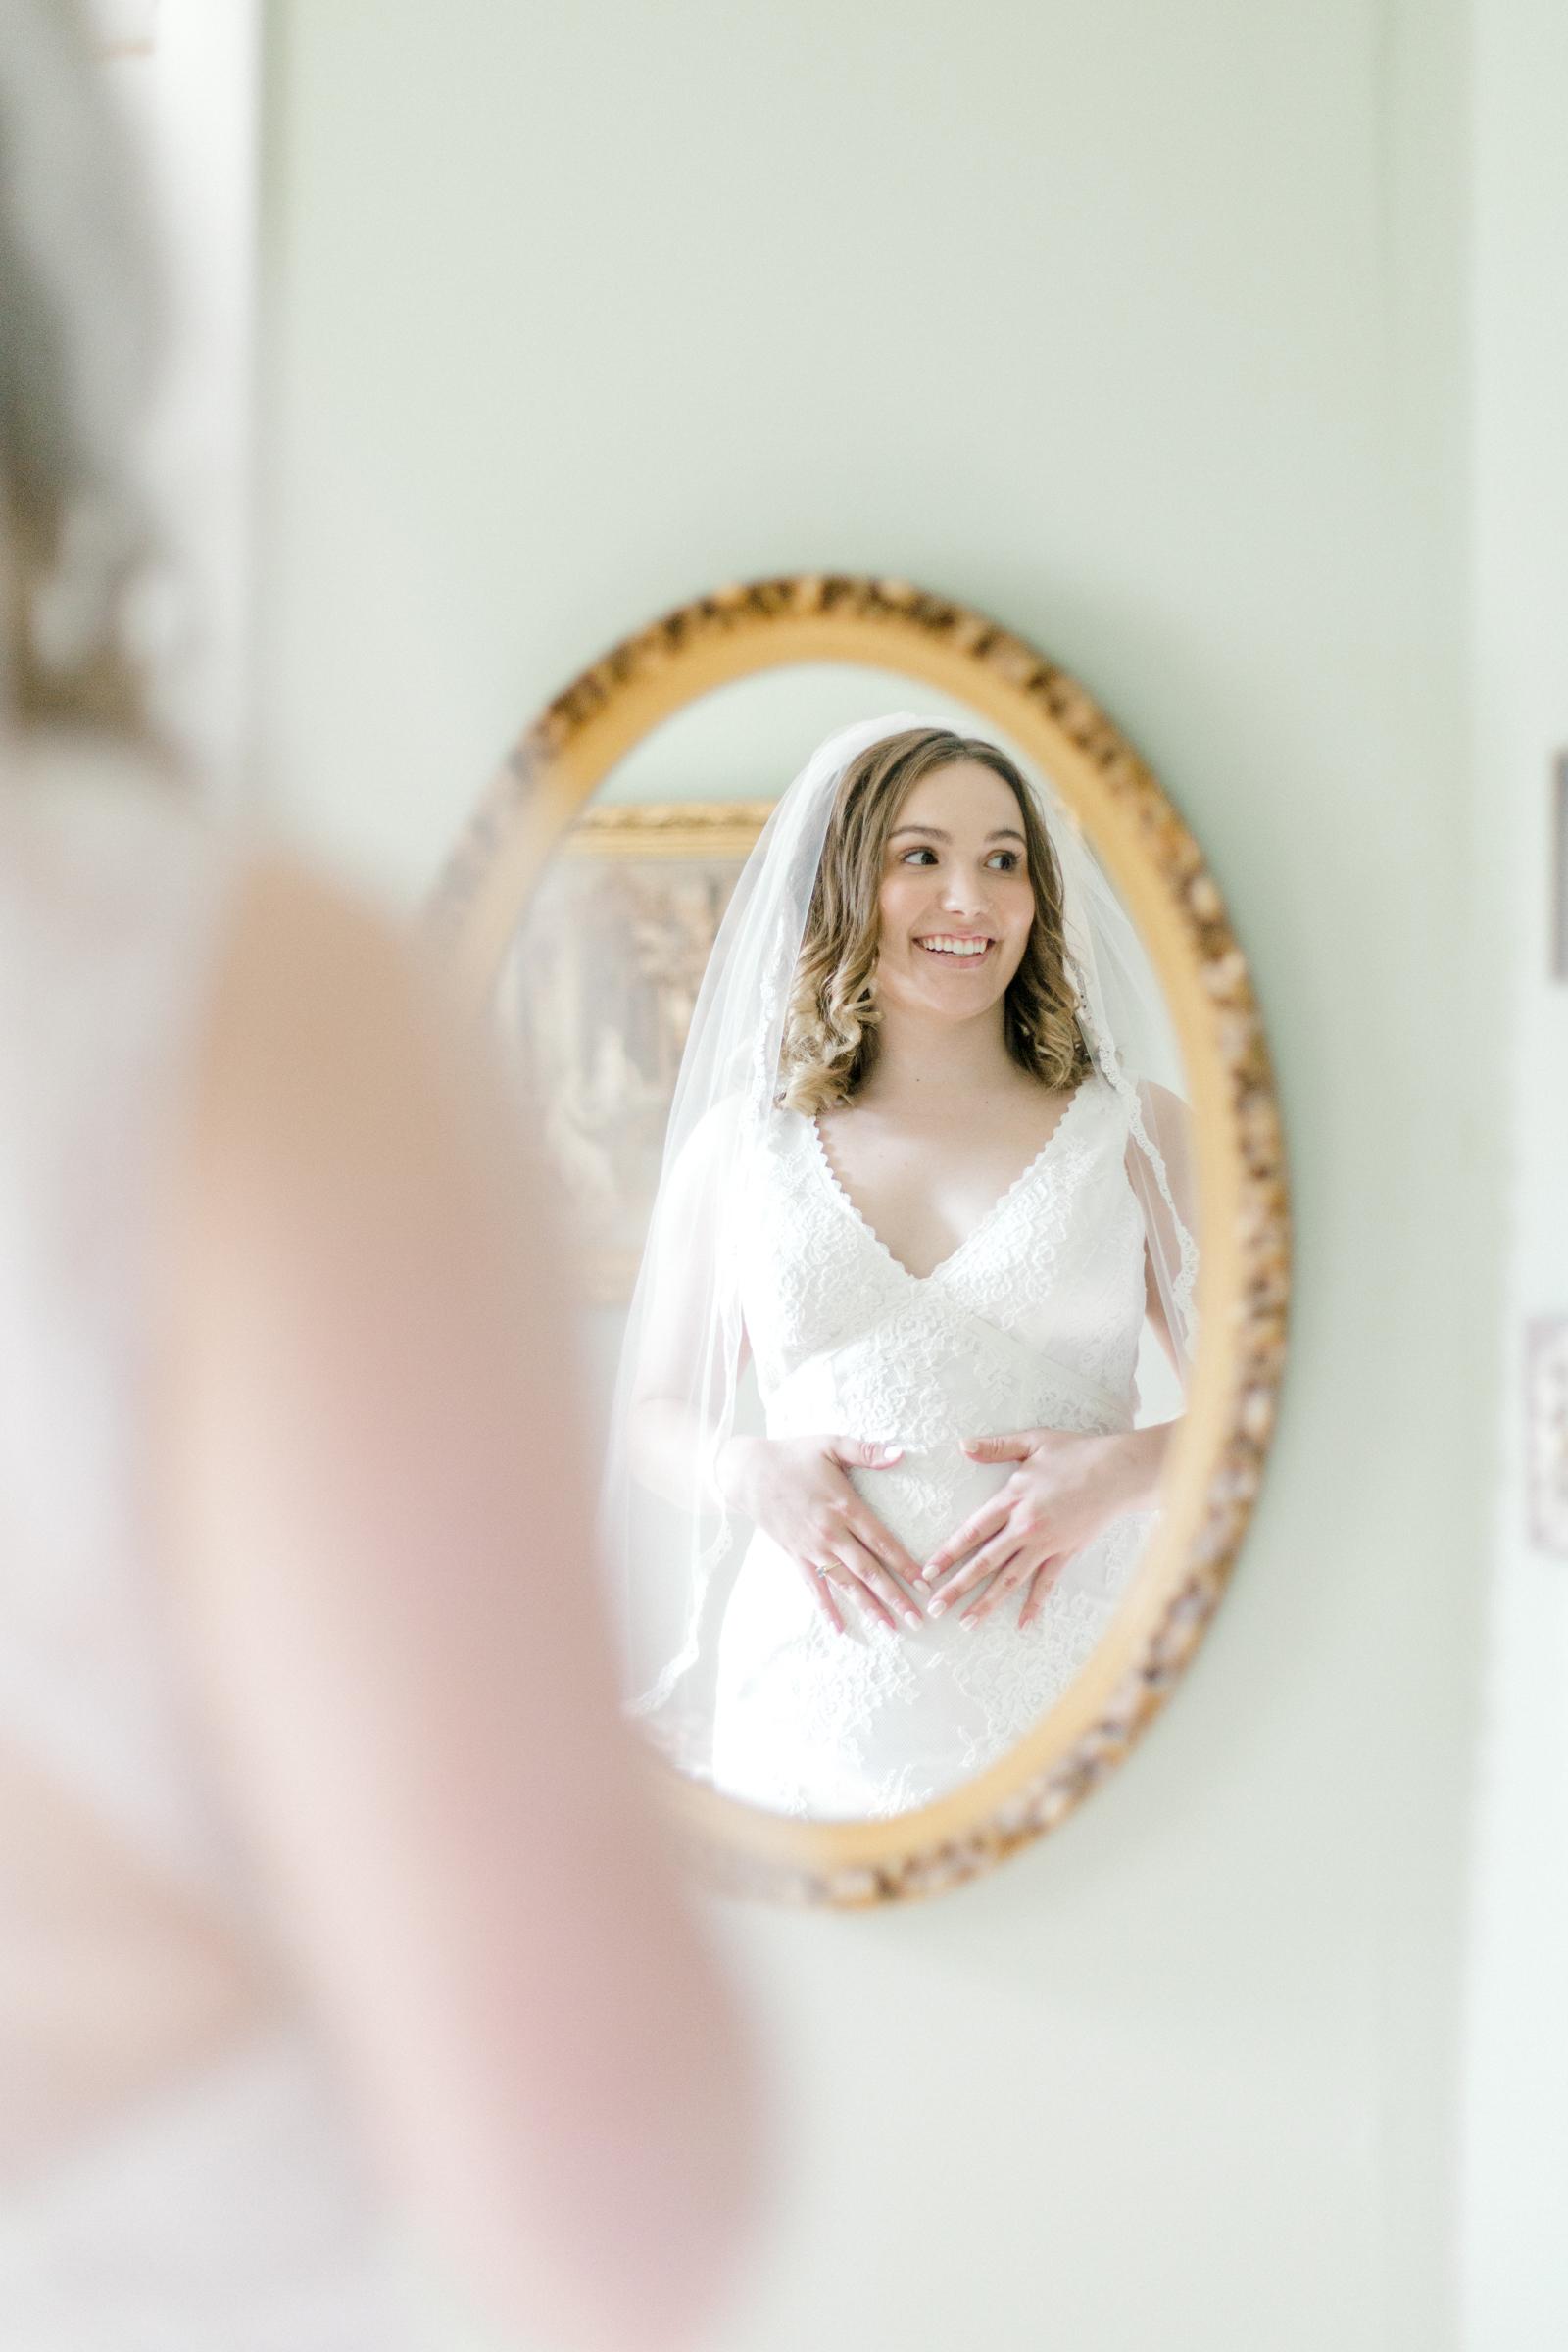 Jessica Sgubin Photography Wedding Engagement Couples Family Atlanta Decatur Marietta Kennesaw Stone Mountain Photographer-10.jpg